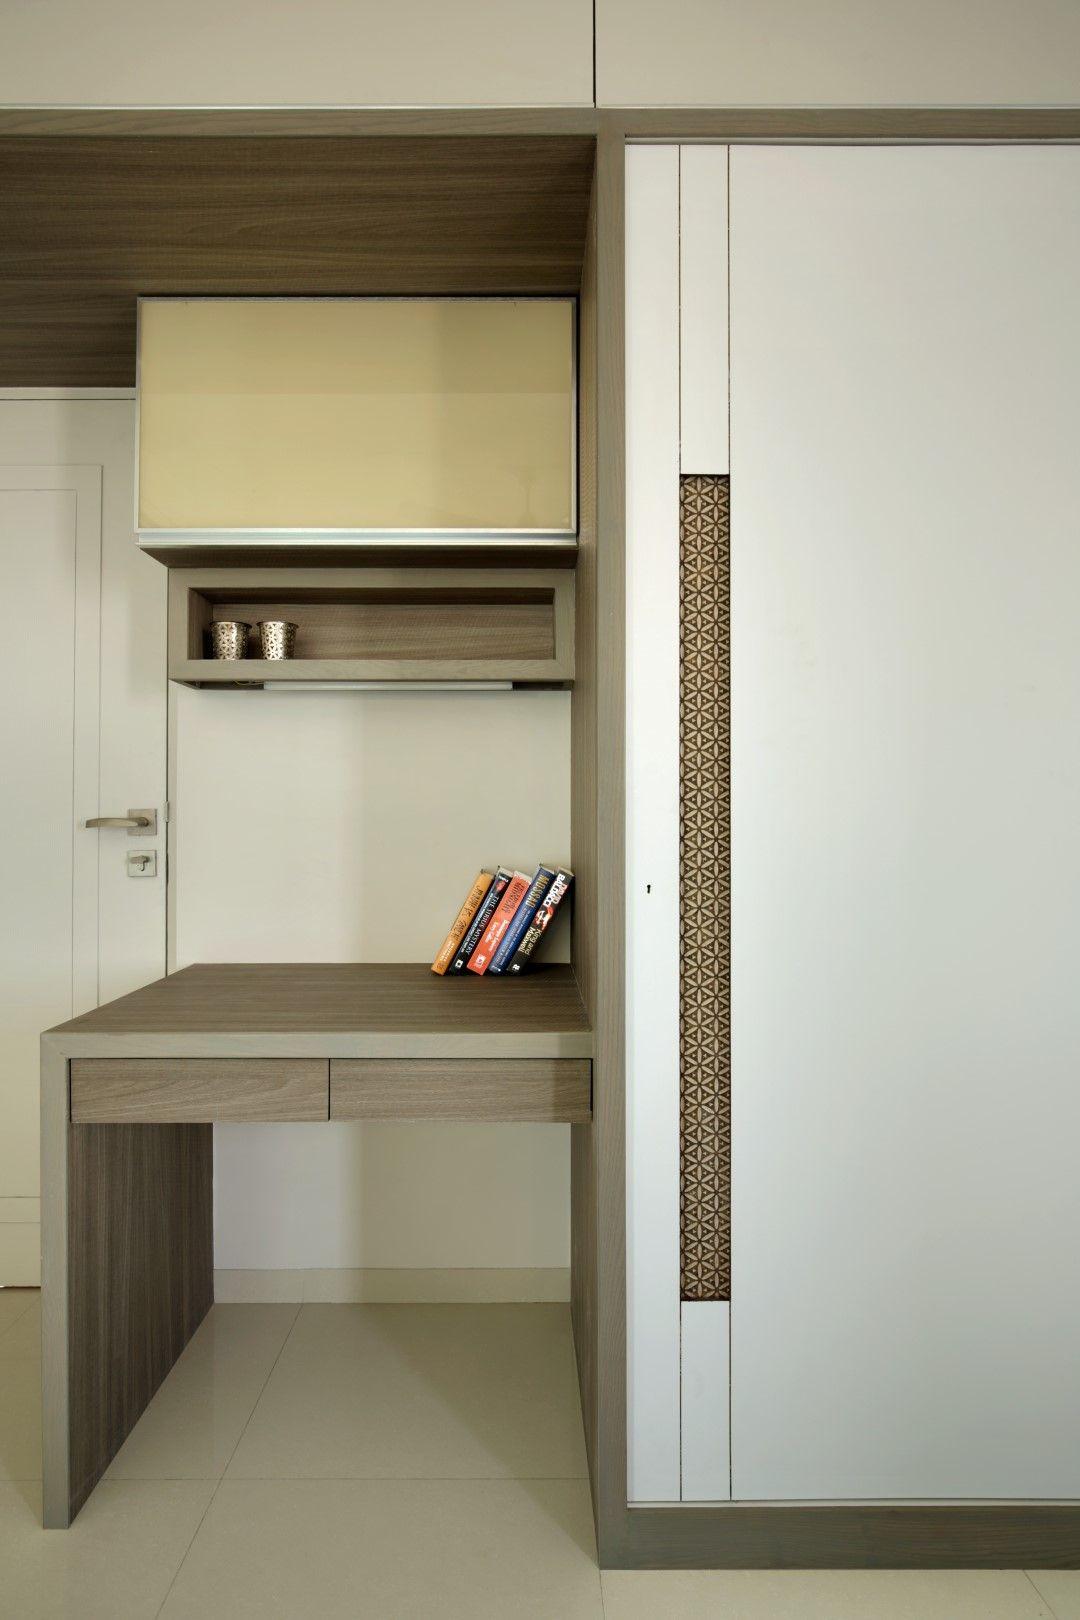 2 Bhk Interior Design Farmhouse Bedroom Decor Interior Design